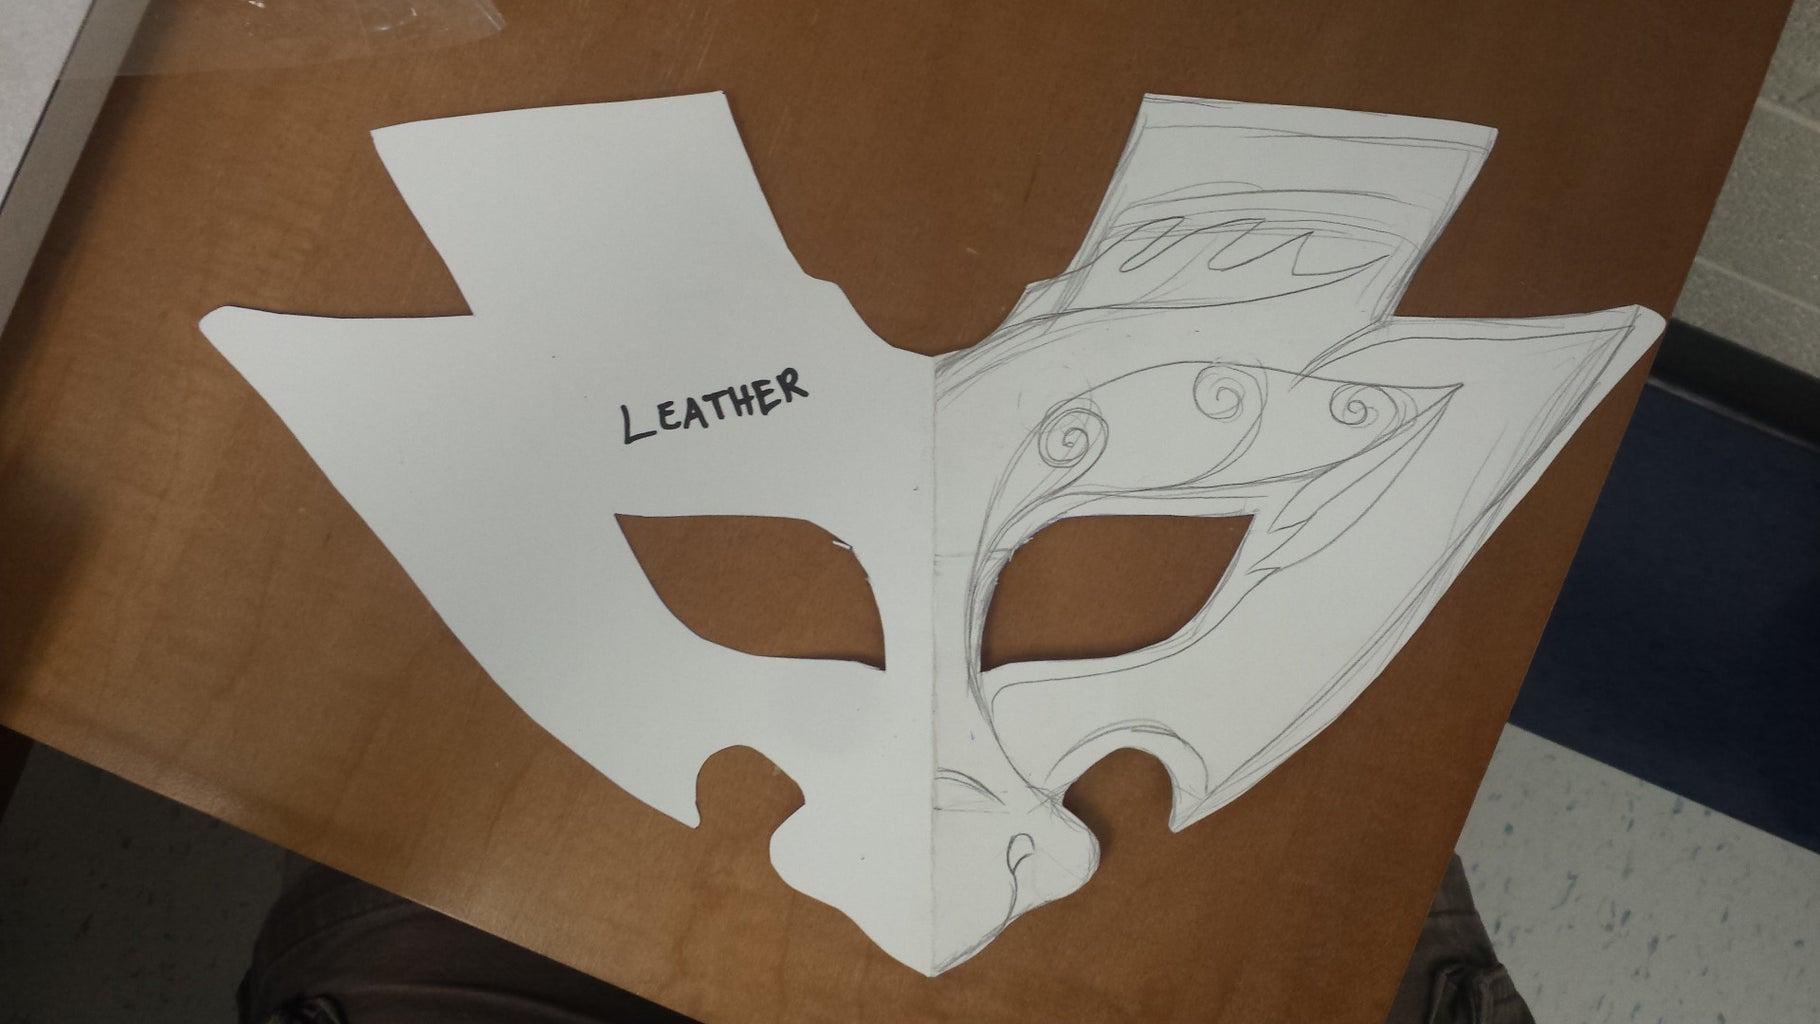 Adding Details and Design